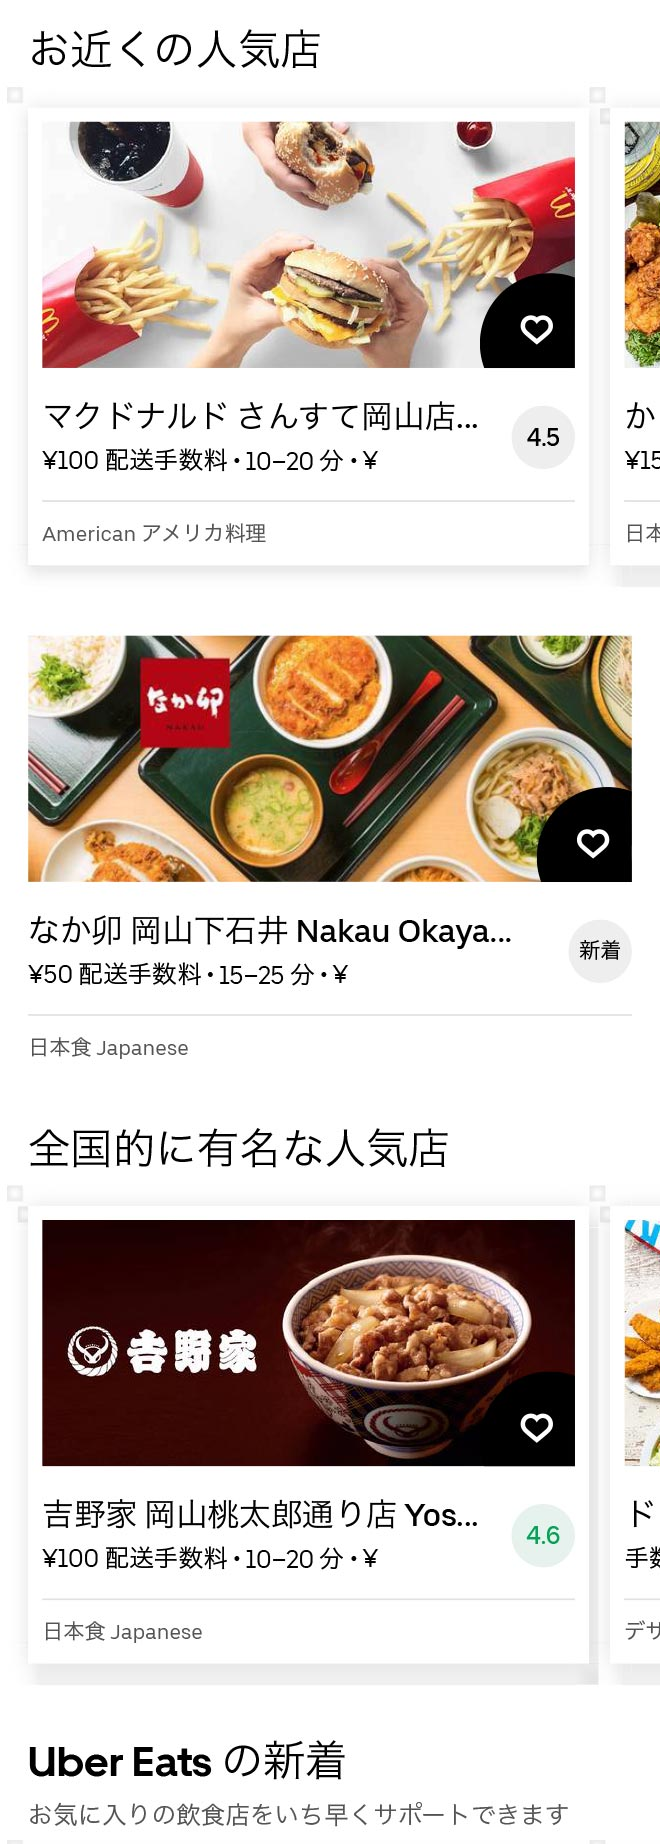 Okayama menu 2011 01